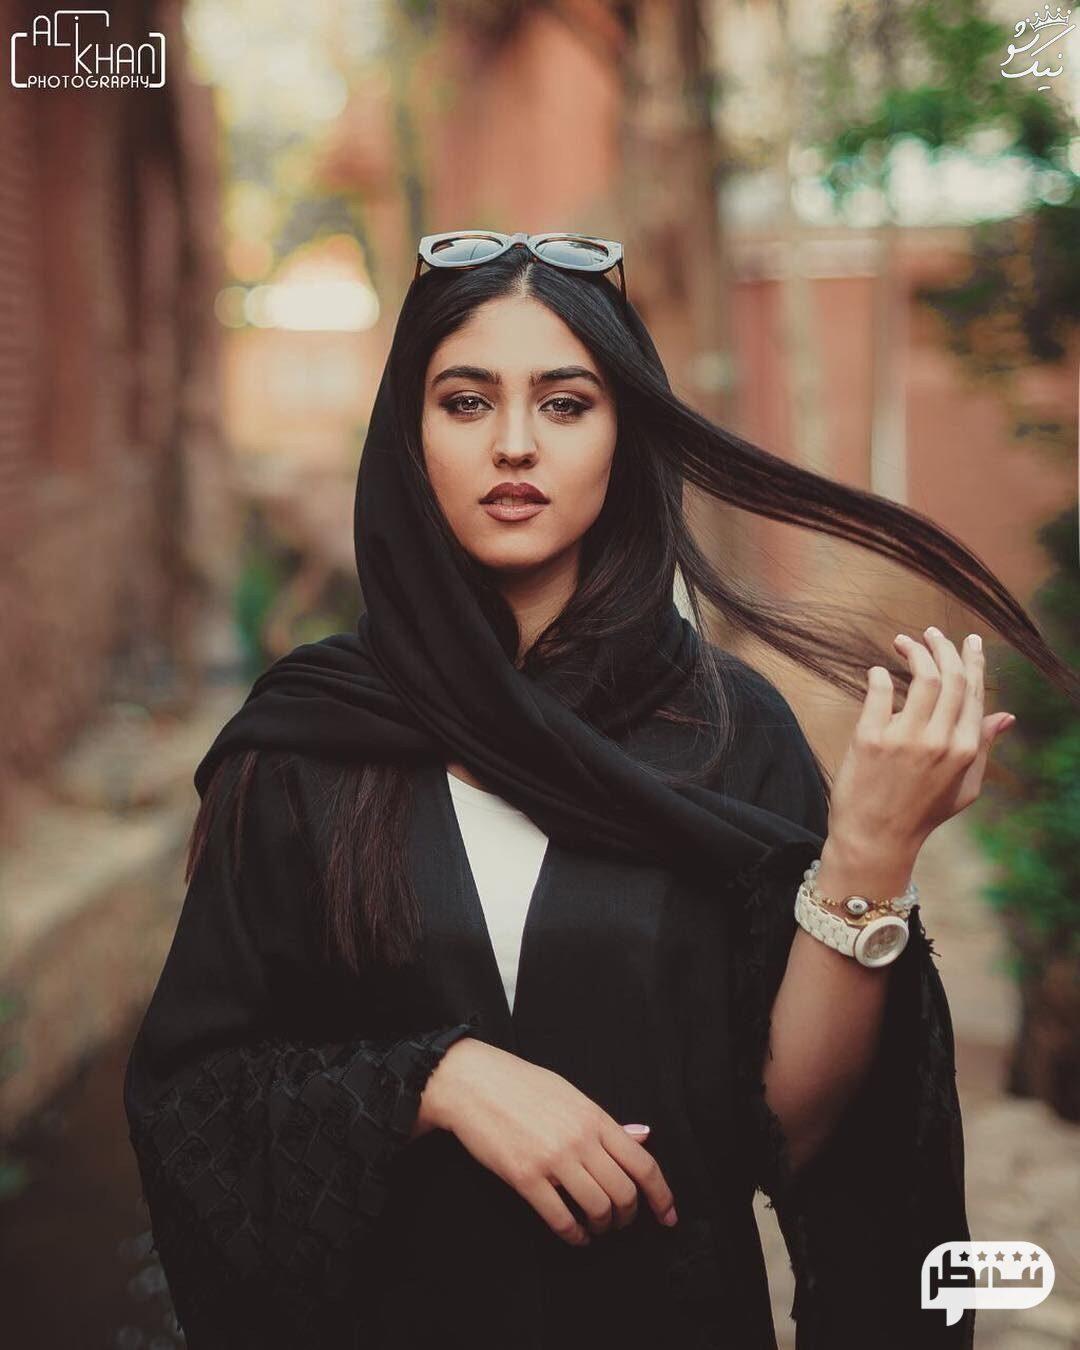 رامینا فشن بلاگر